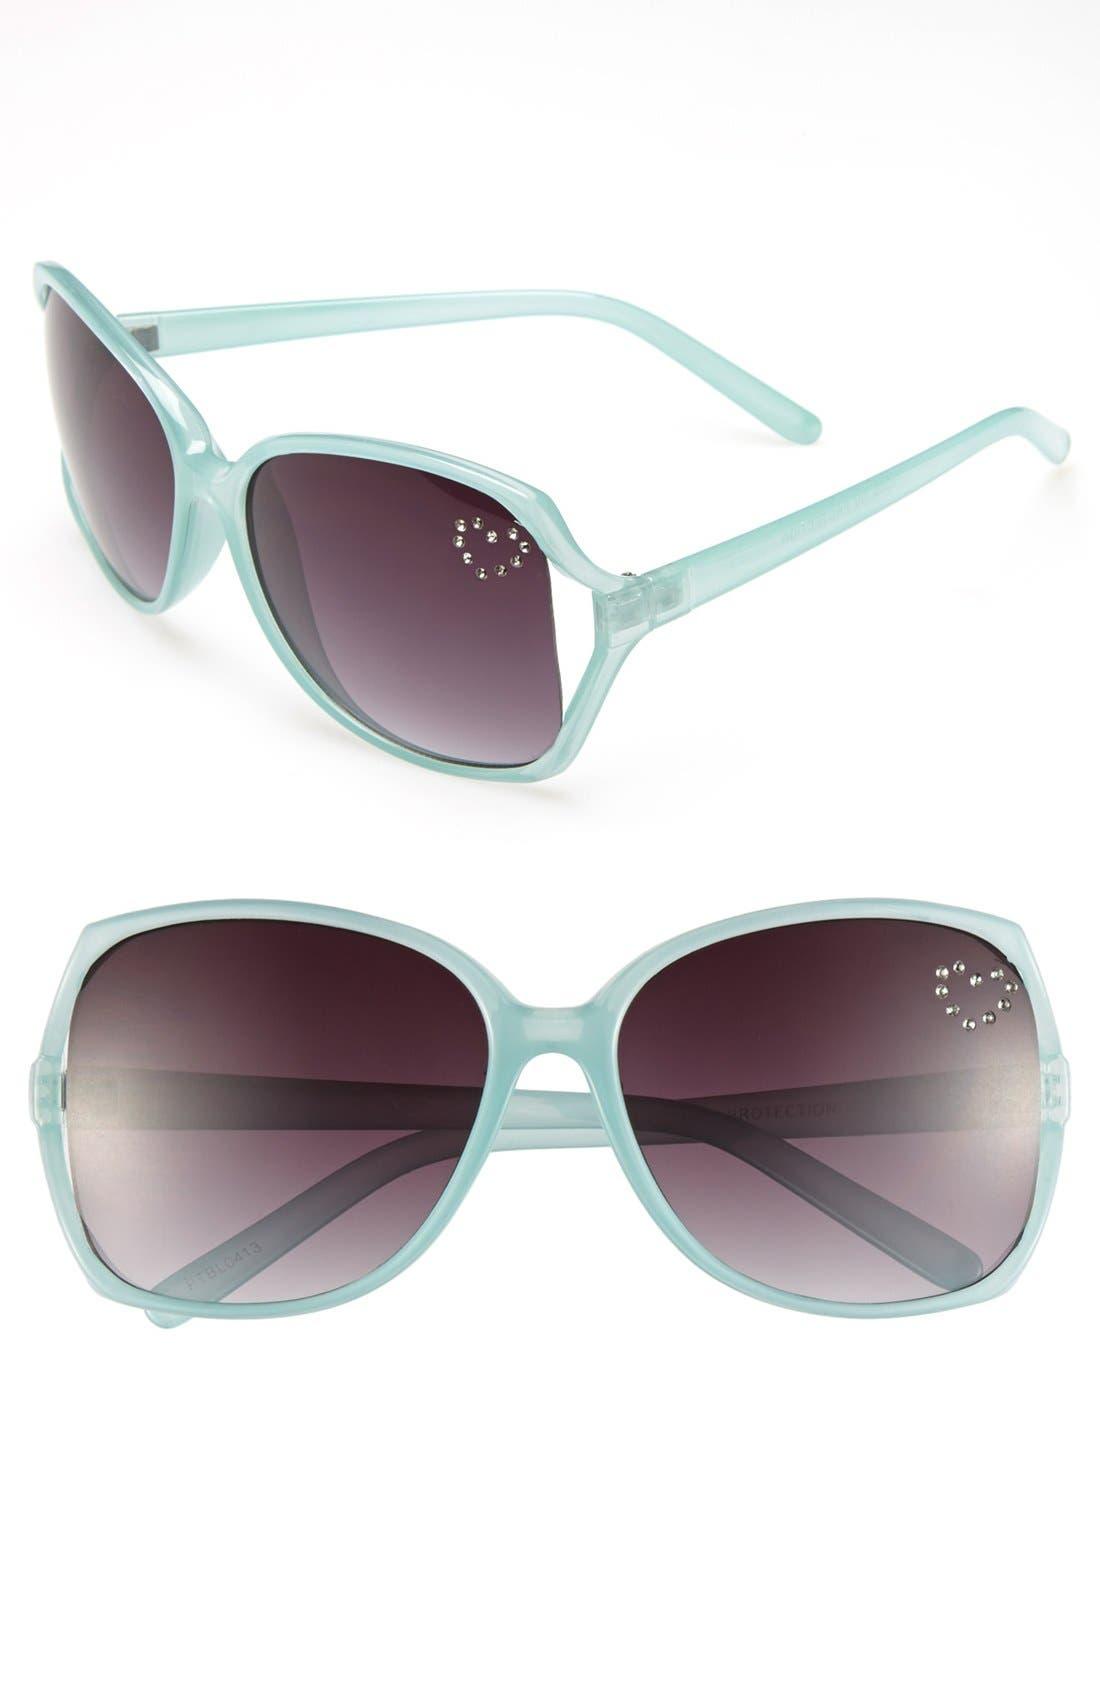 Alternate Image 1 Selected - Fantas Eyes Heart Crystals Sunglasses (Girls)